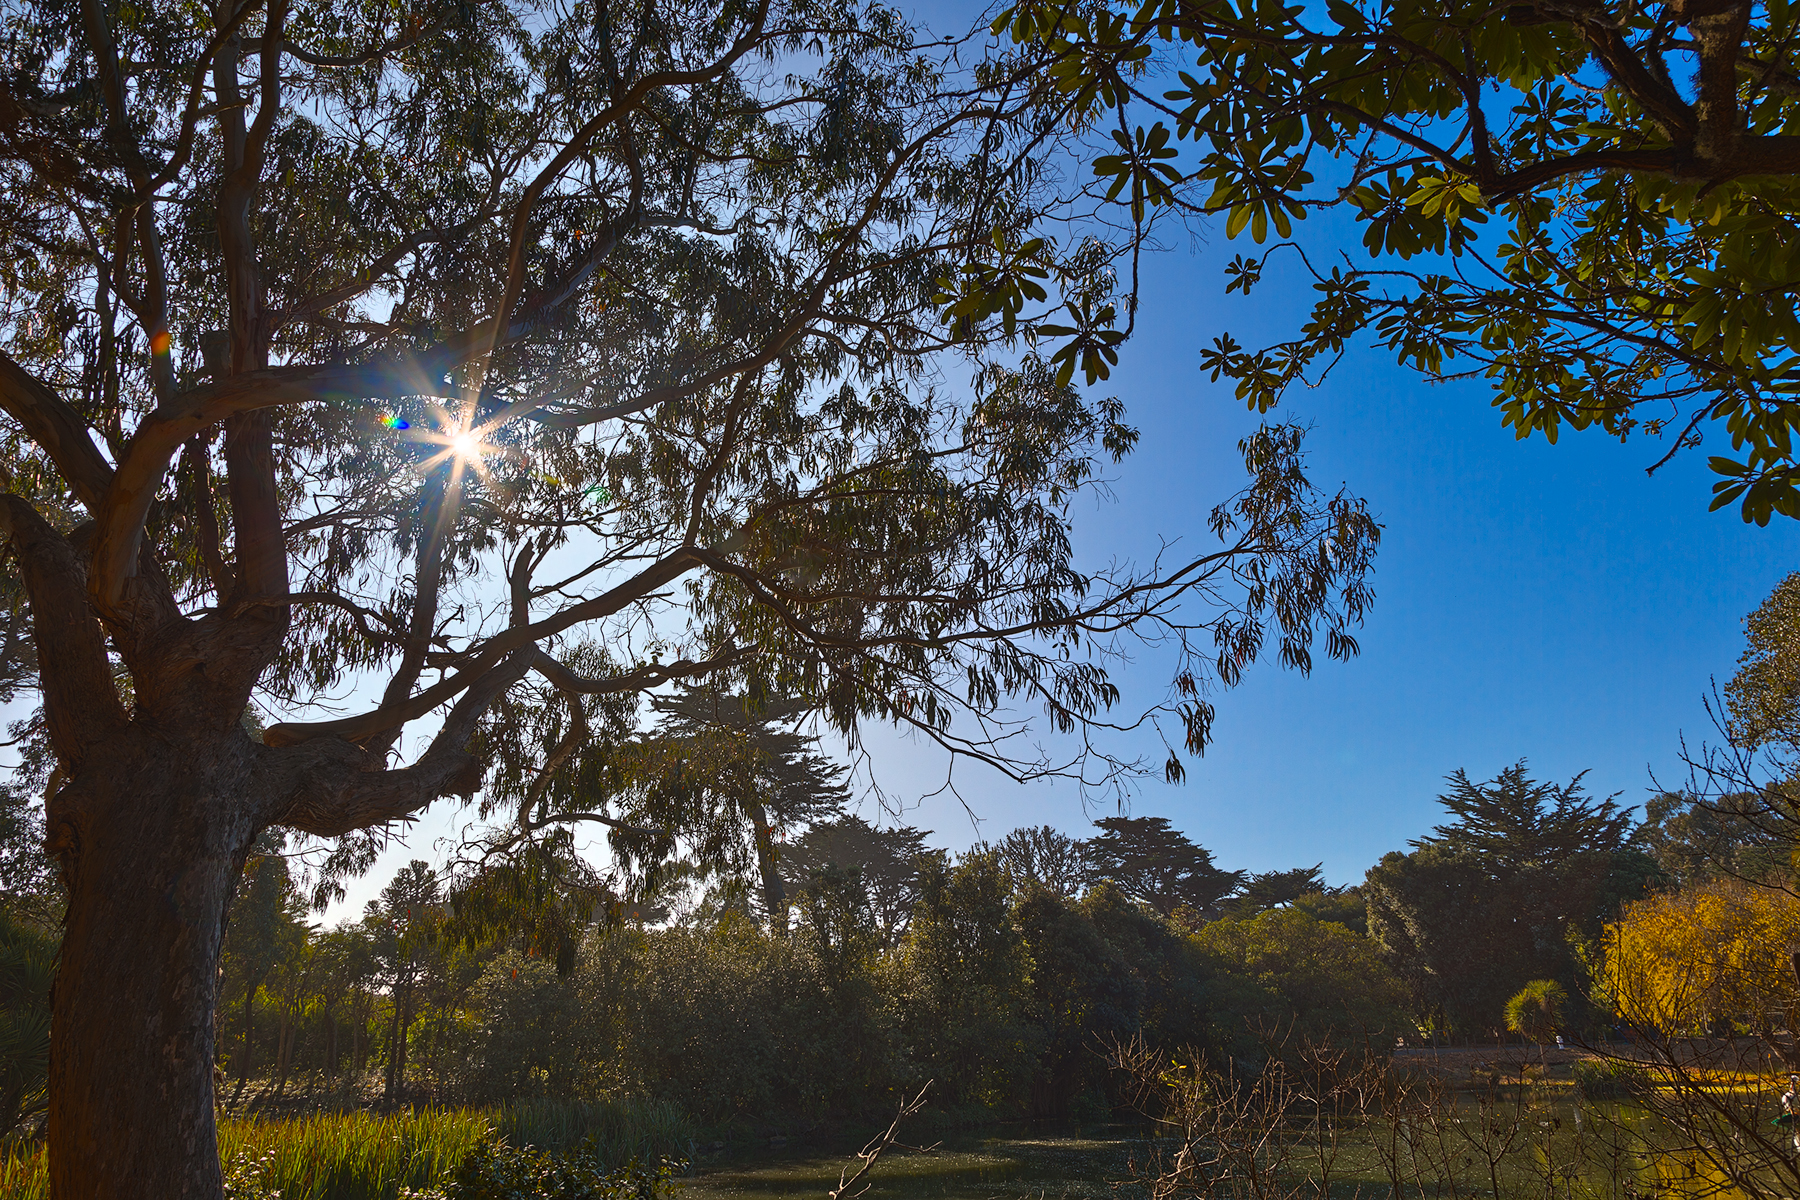 Zoo foliage & sunlight - hdr photo